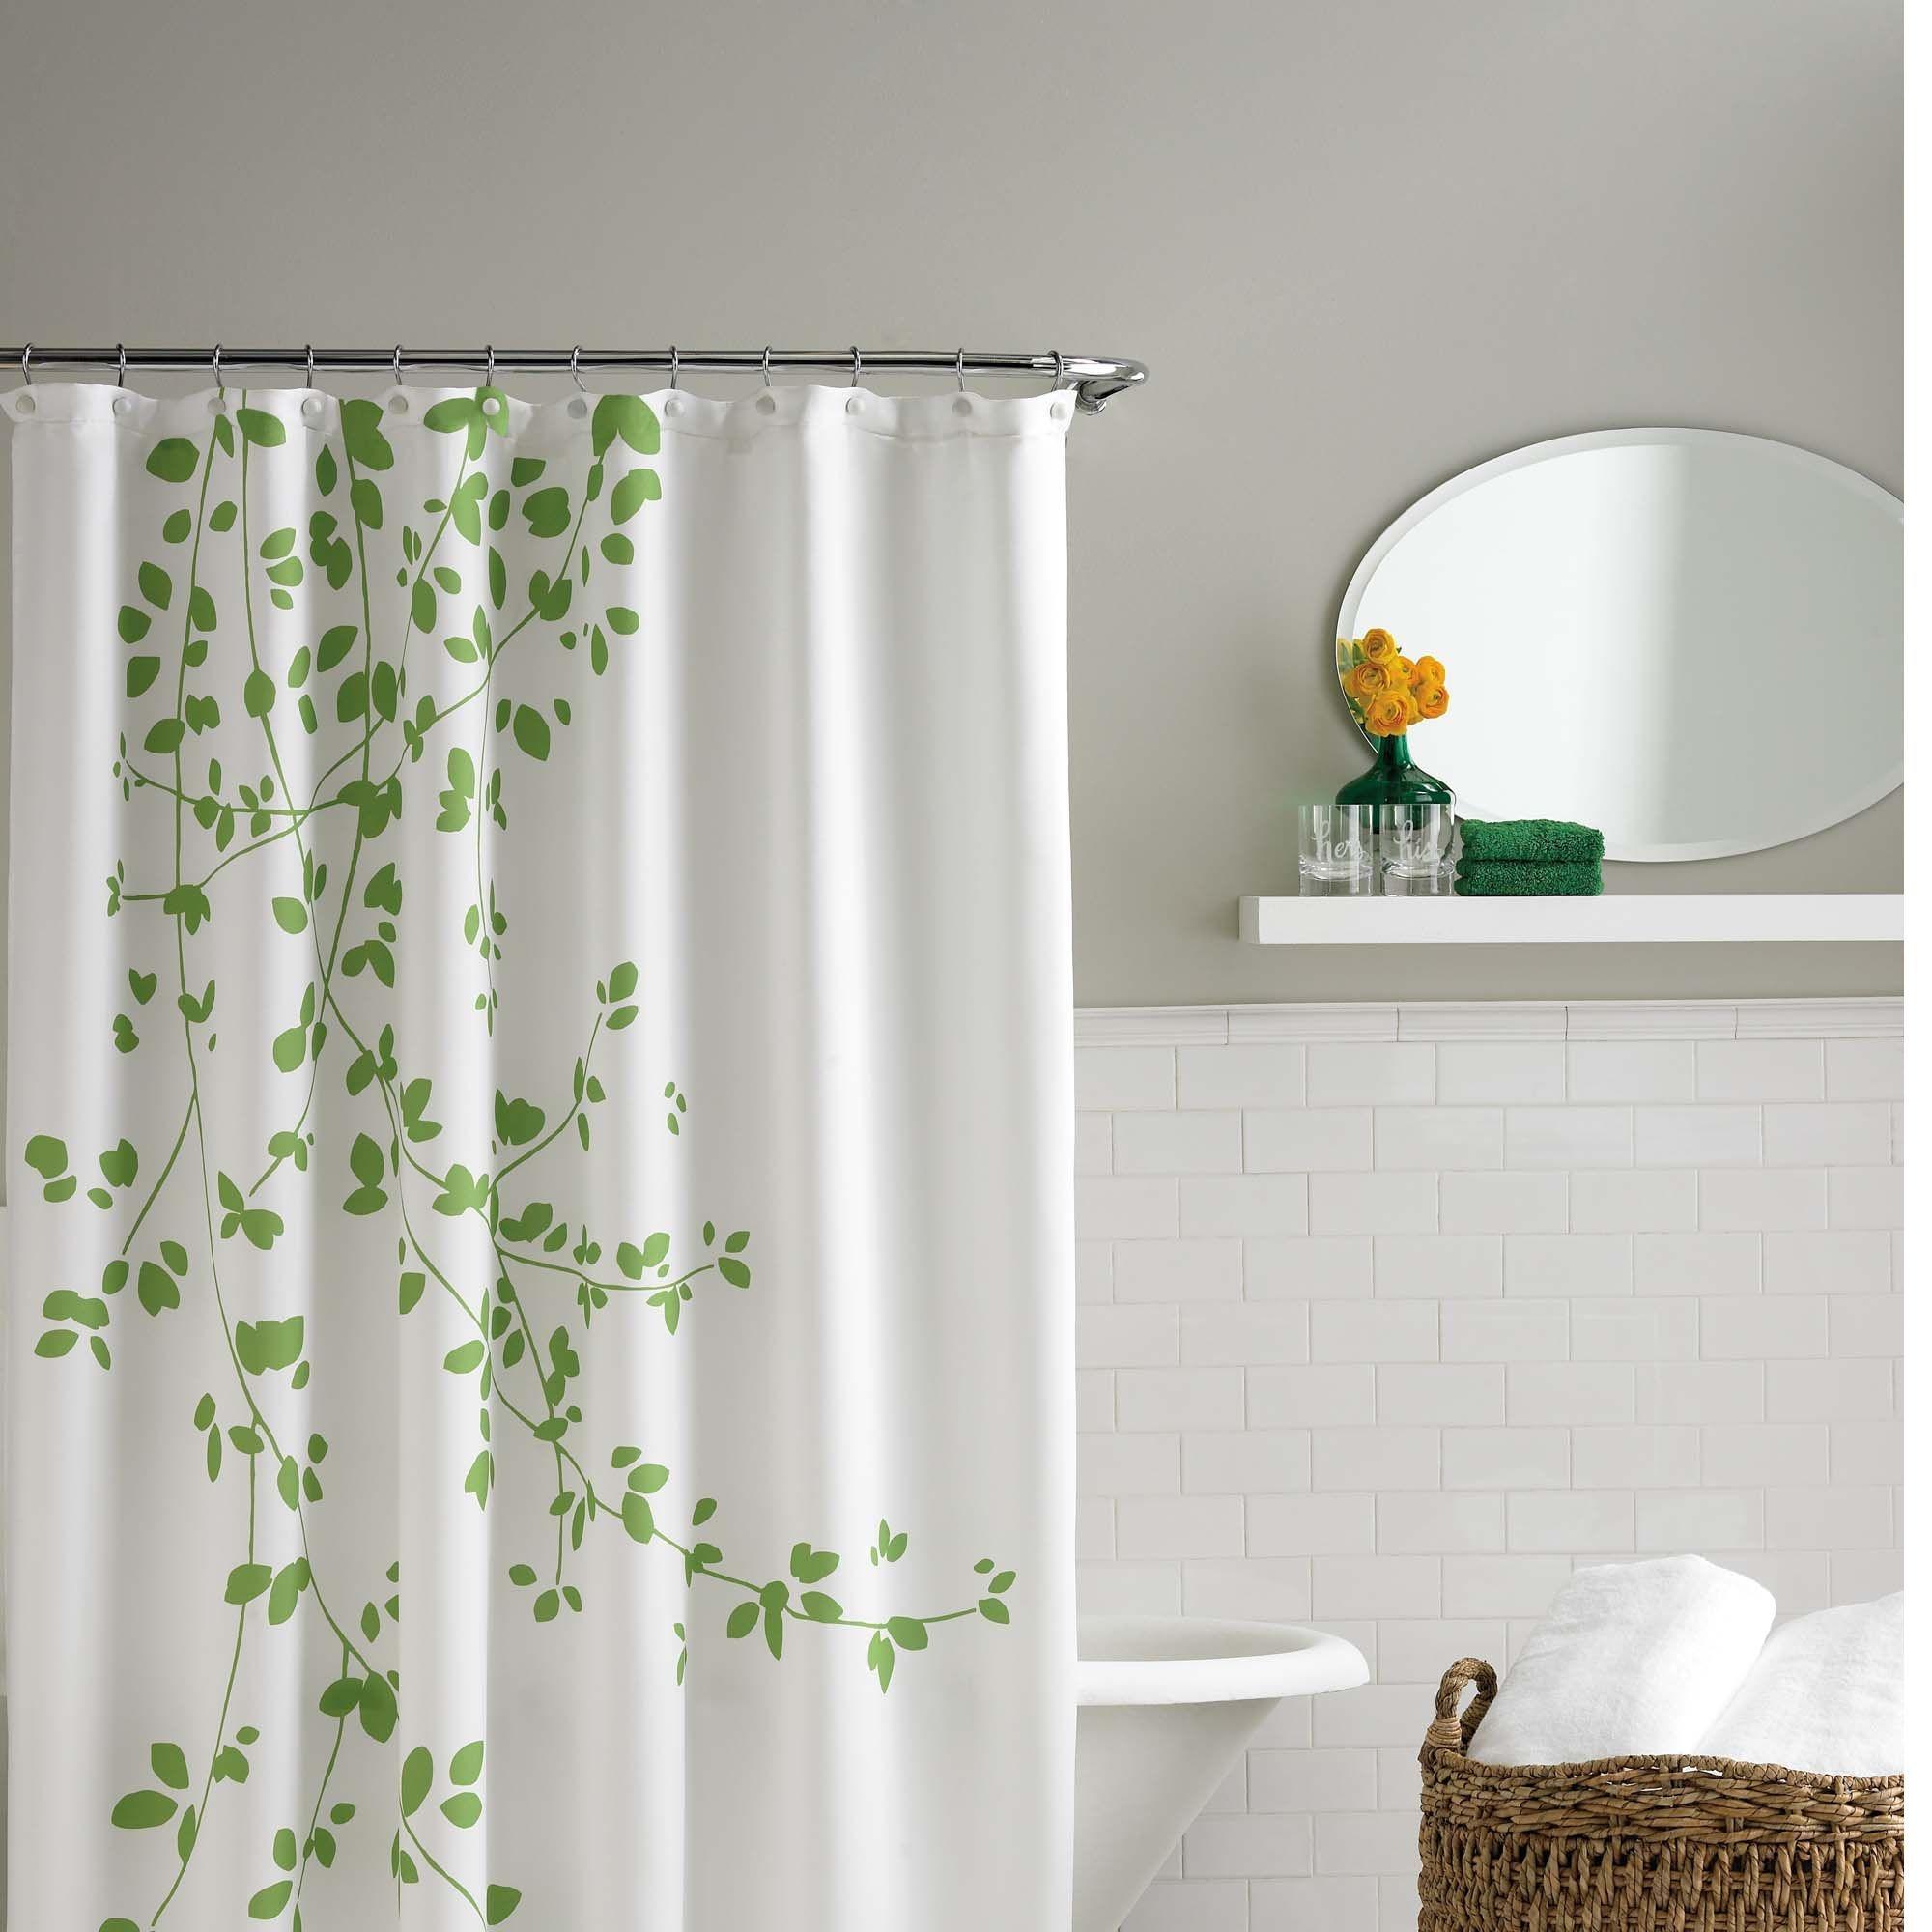 Incroyable Green Leaf Shower Curtain